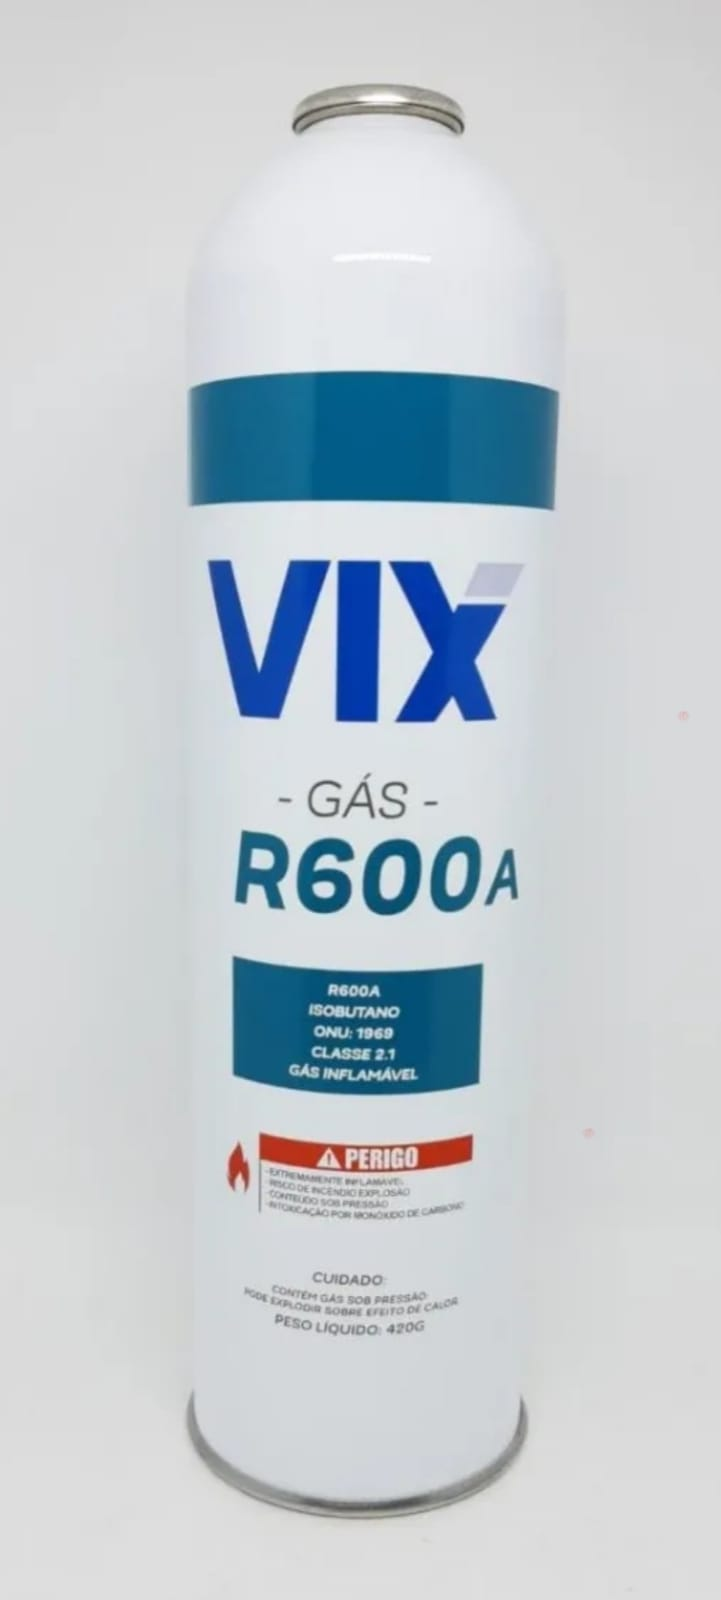 Gás R600a Lata Cilindro 420G